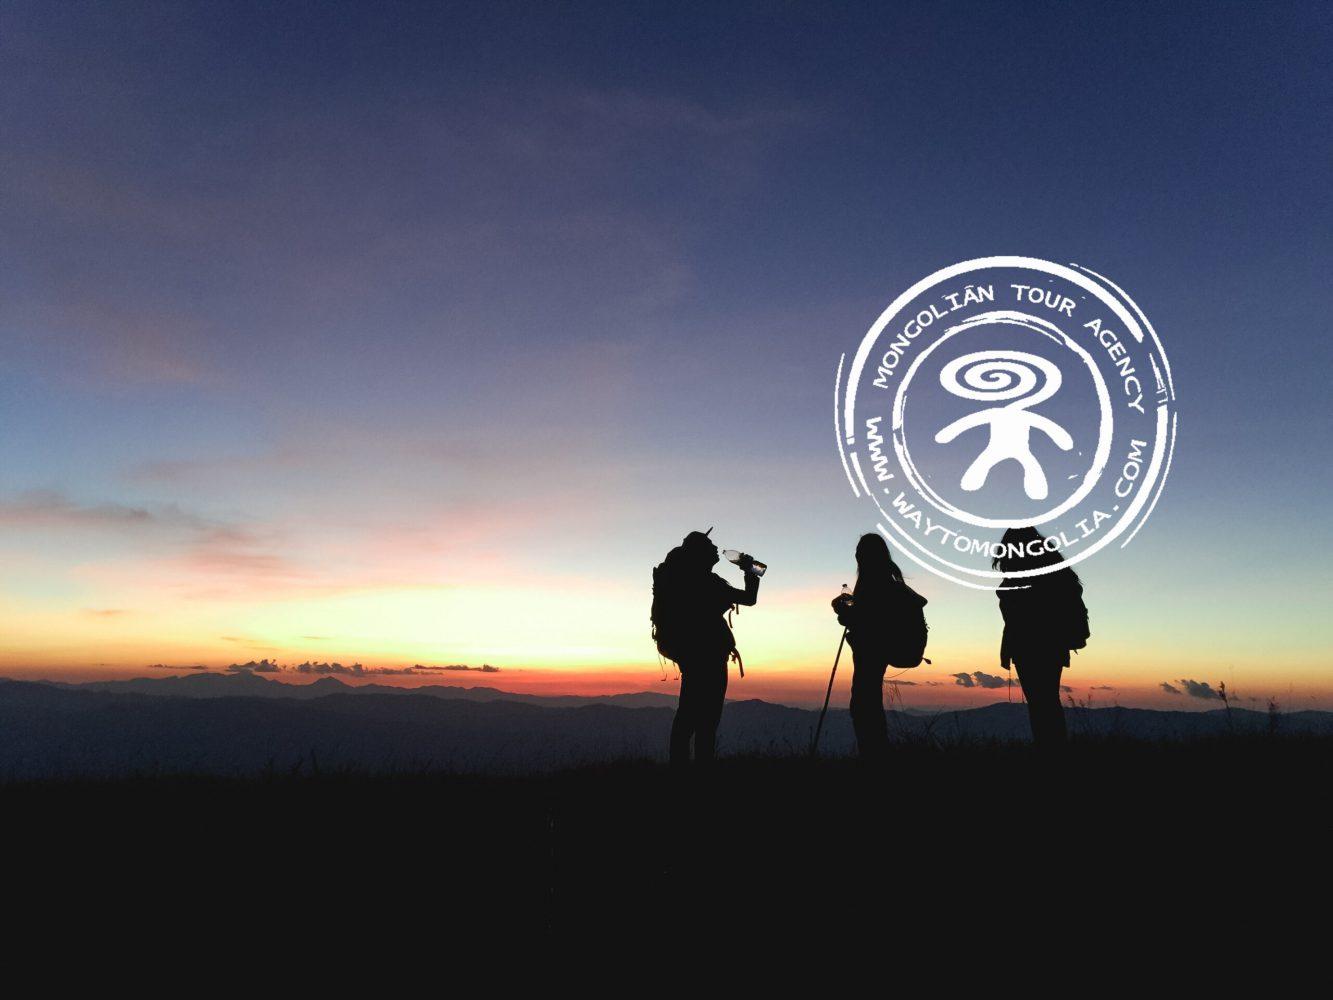 photo tours in mongolia